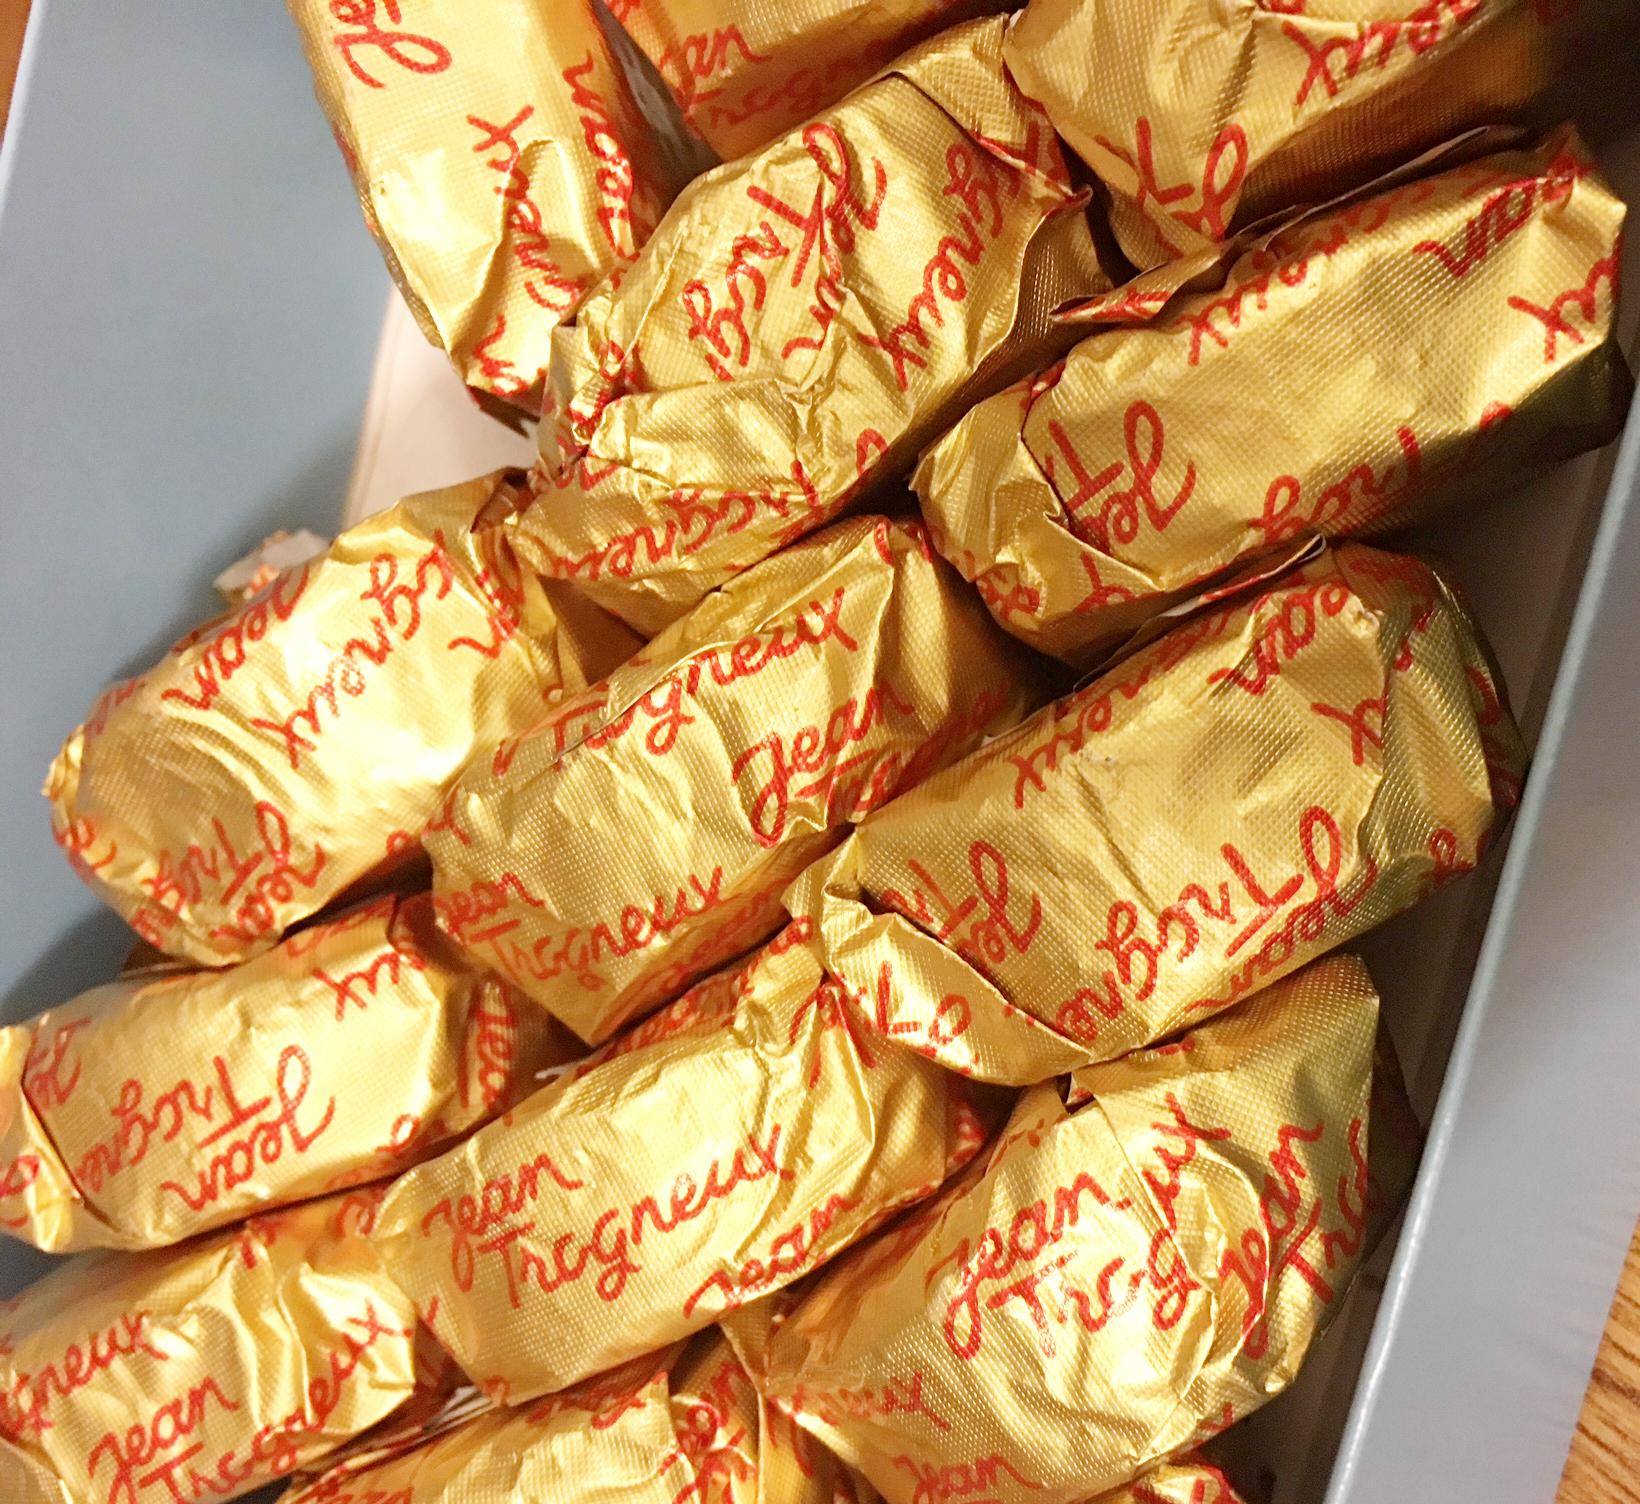 macaron amiens specialites gourmandises.JPG